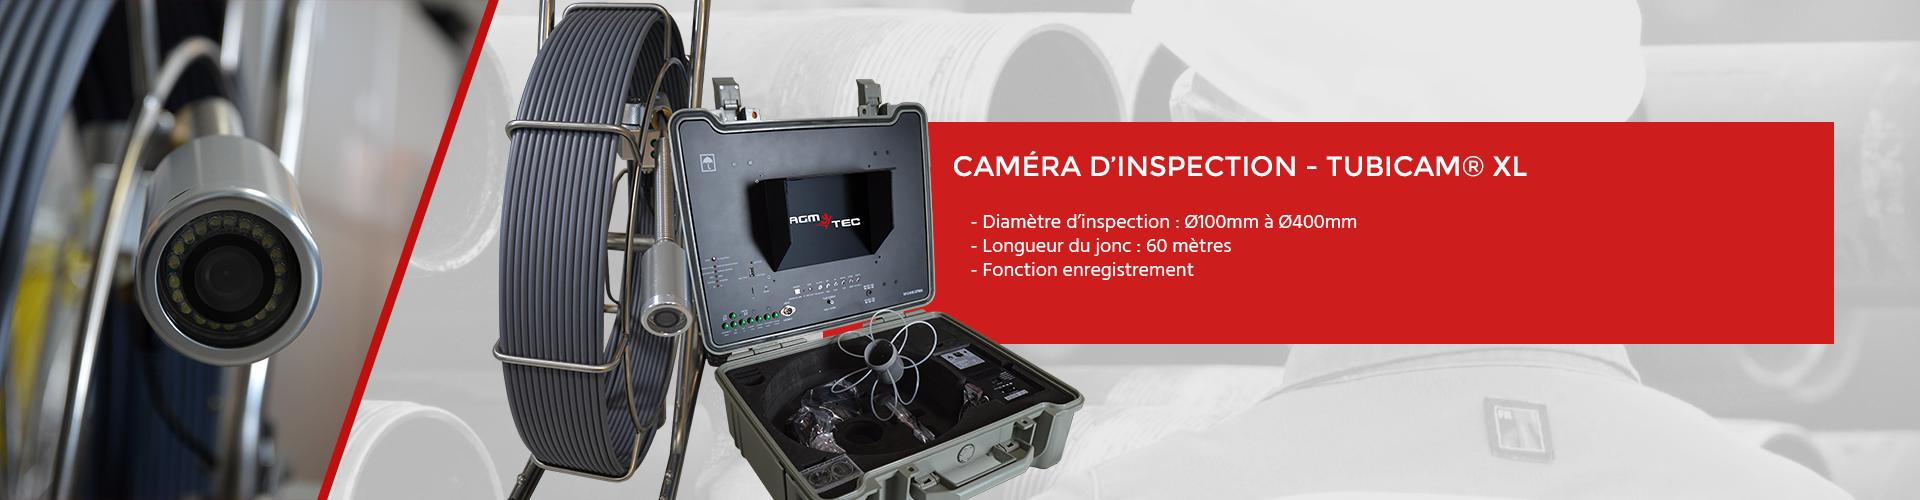 Caméra canalisation tubicam XL